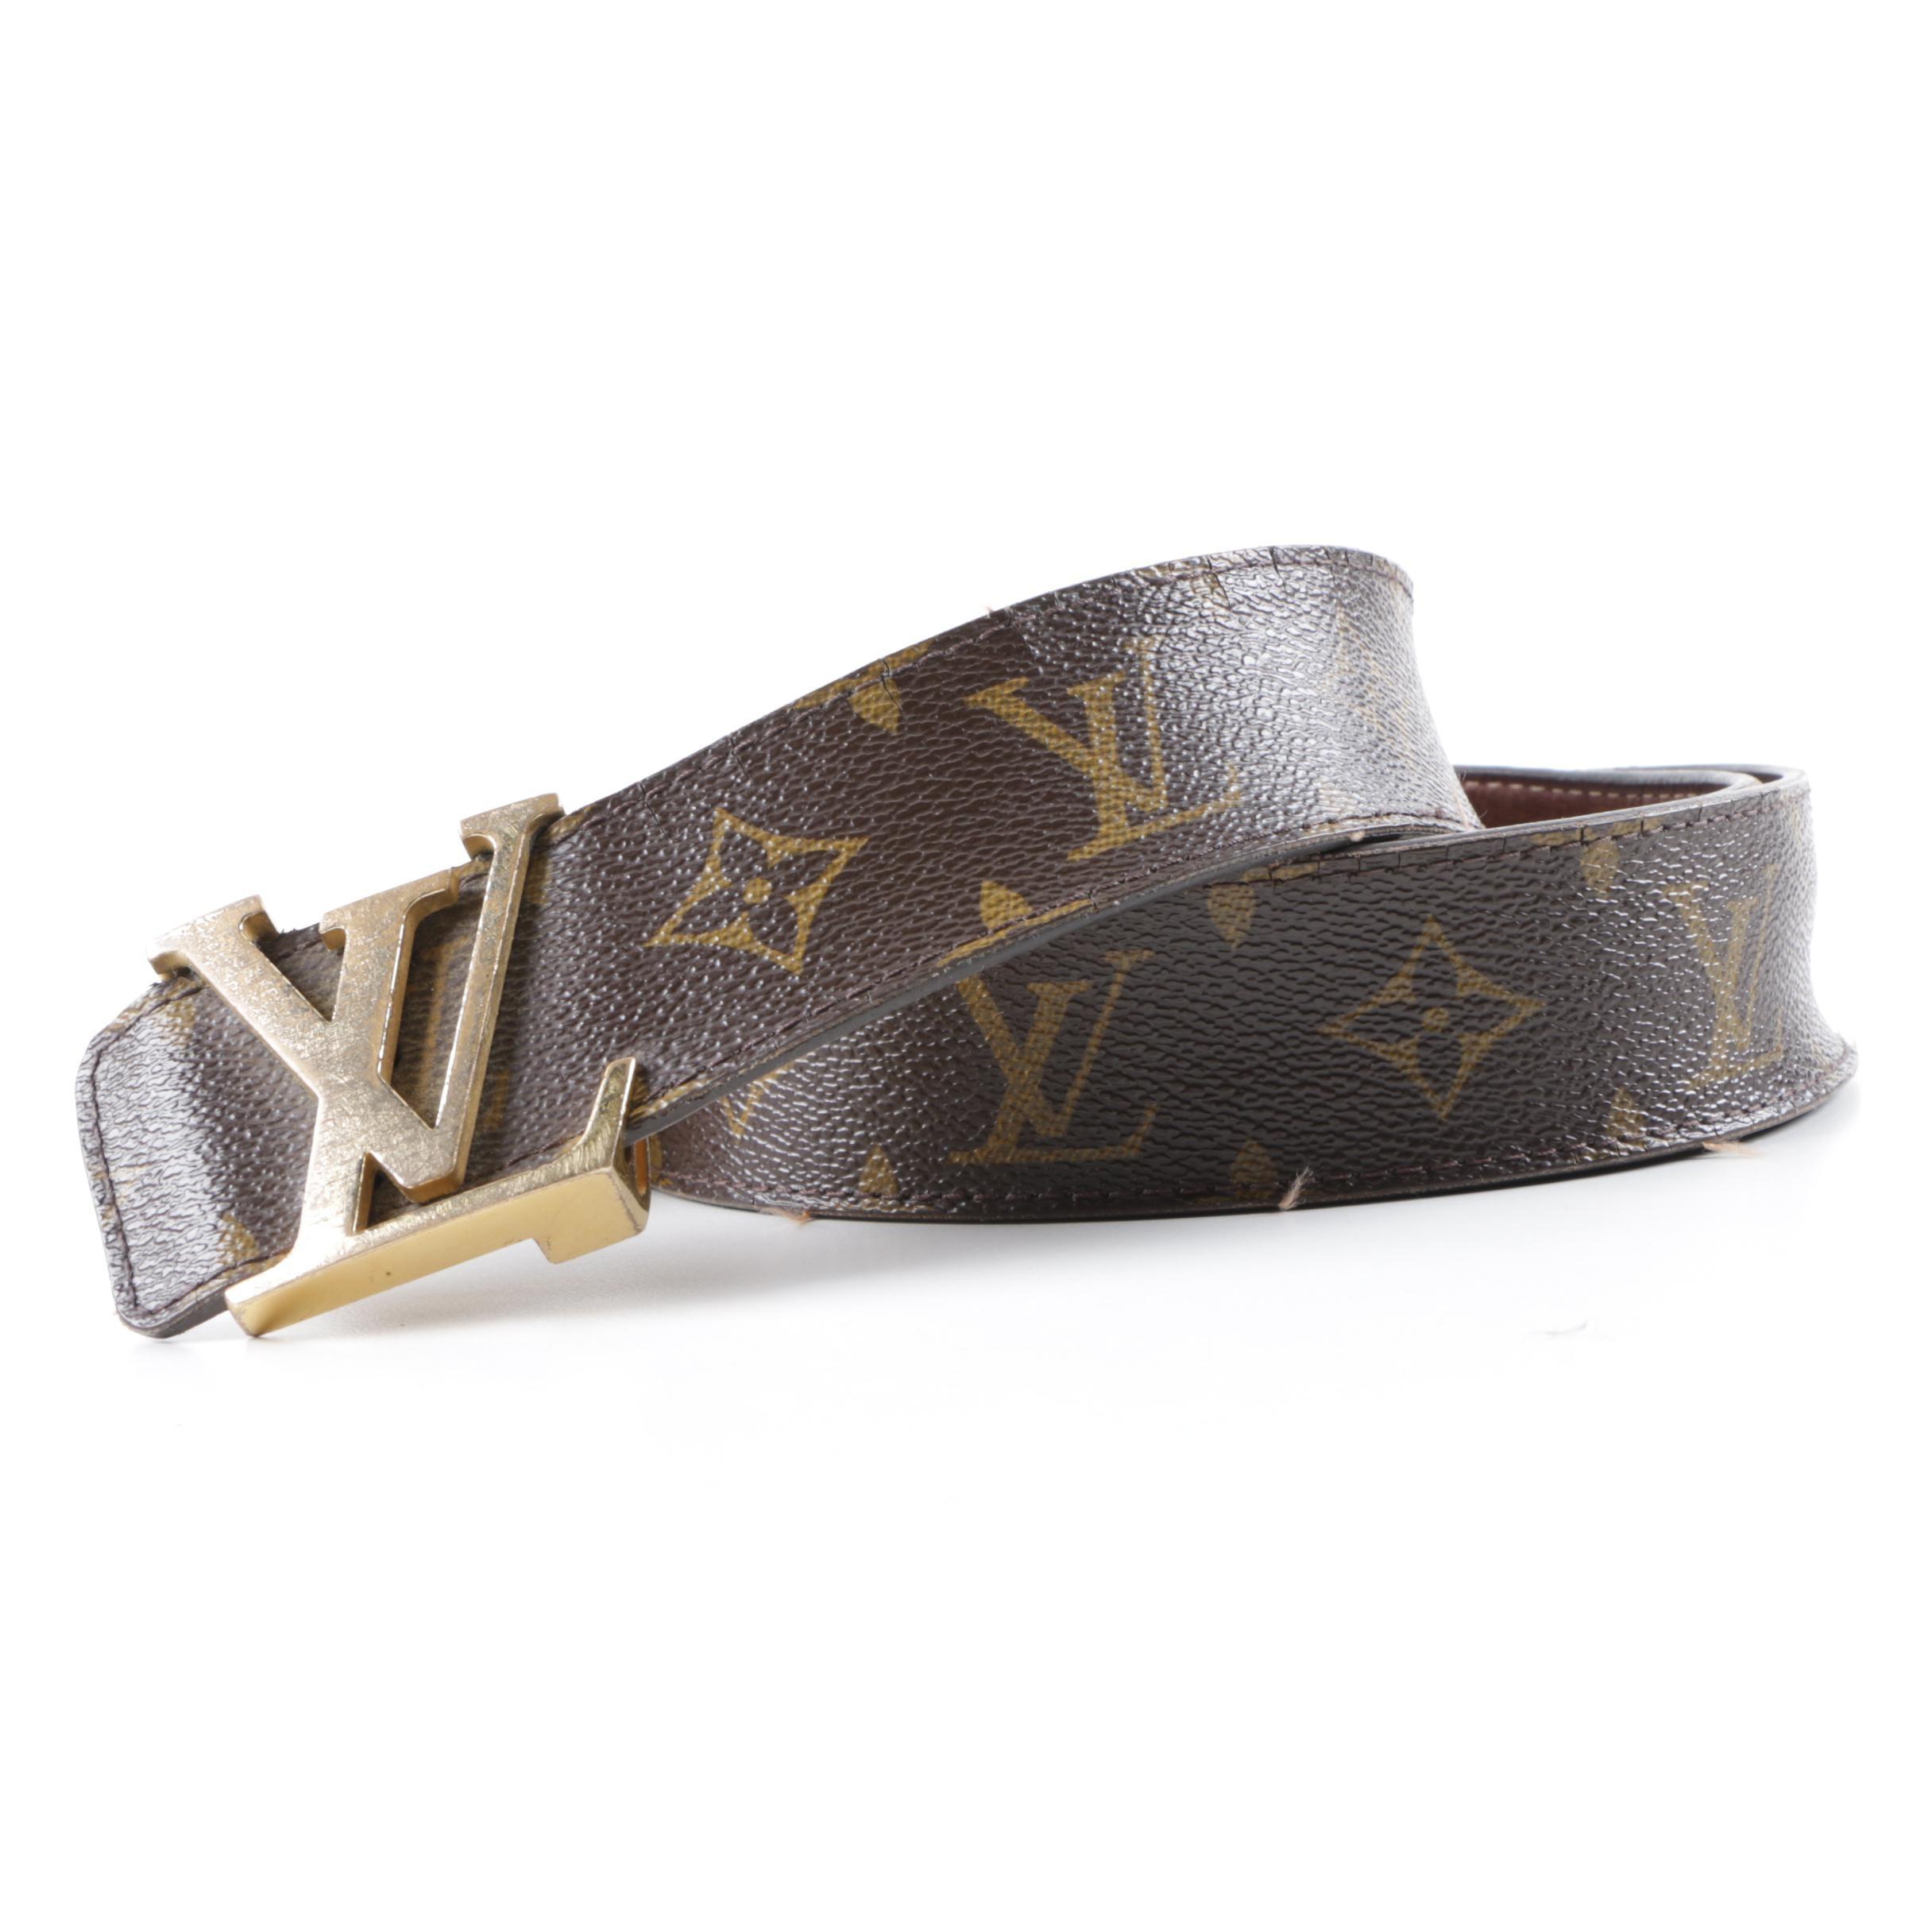 Louis Vuitton Monogram Canvas Belt with Buckle